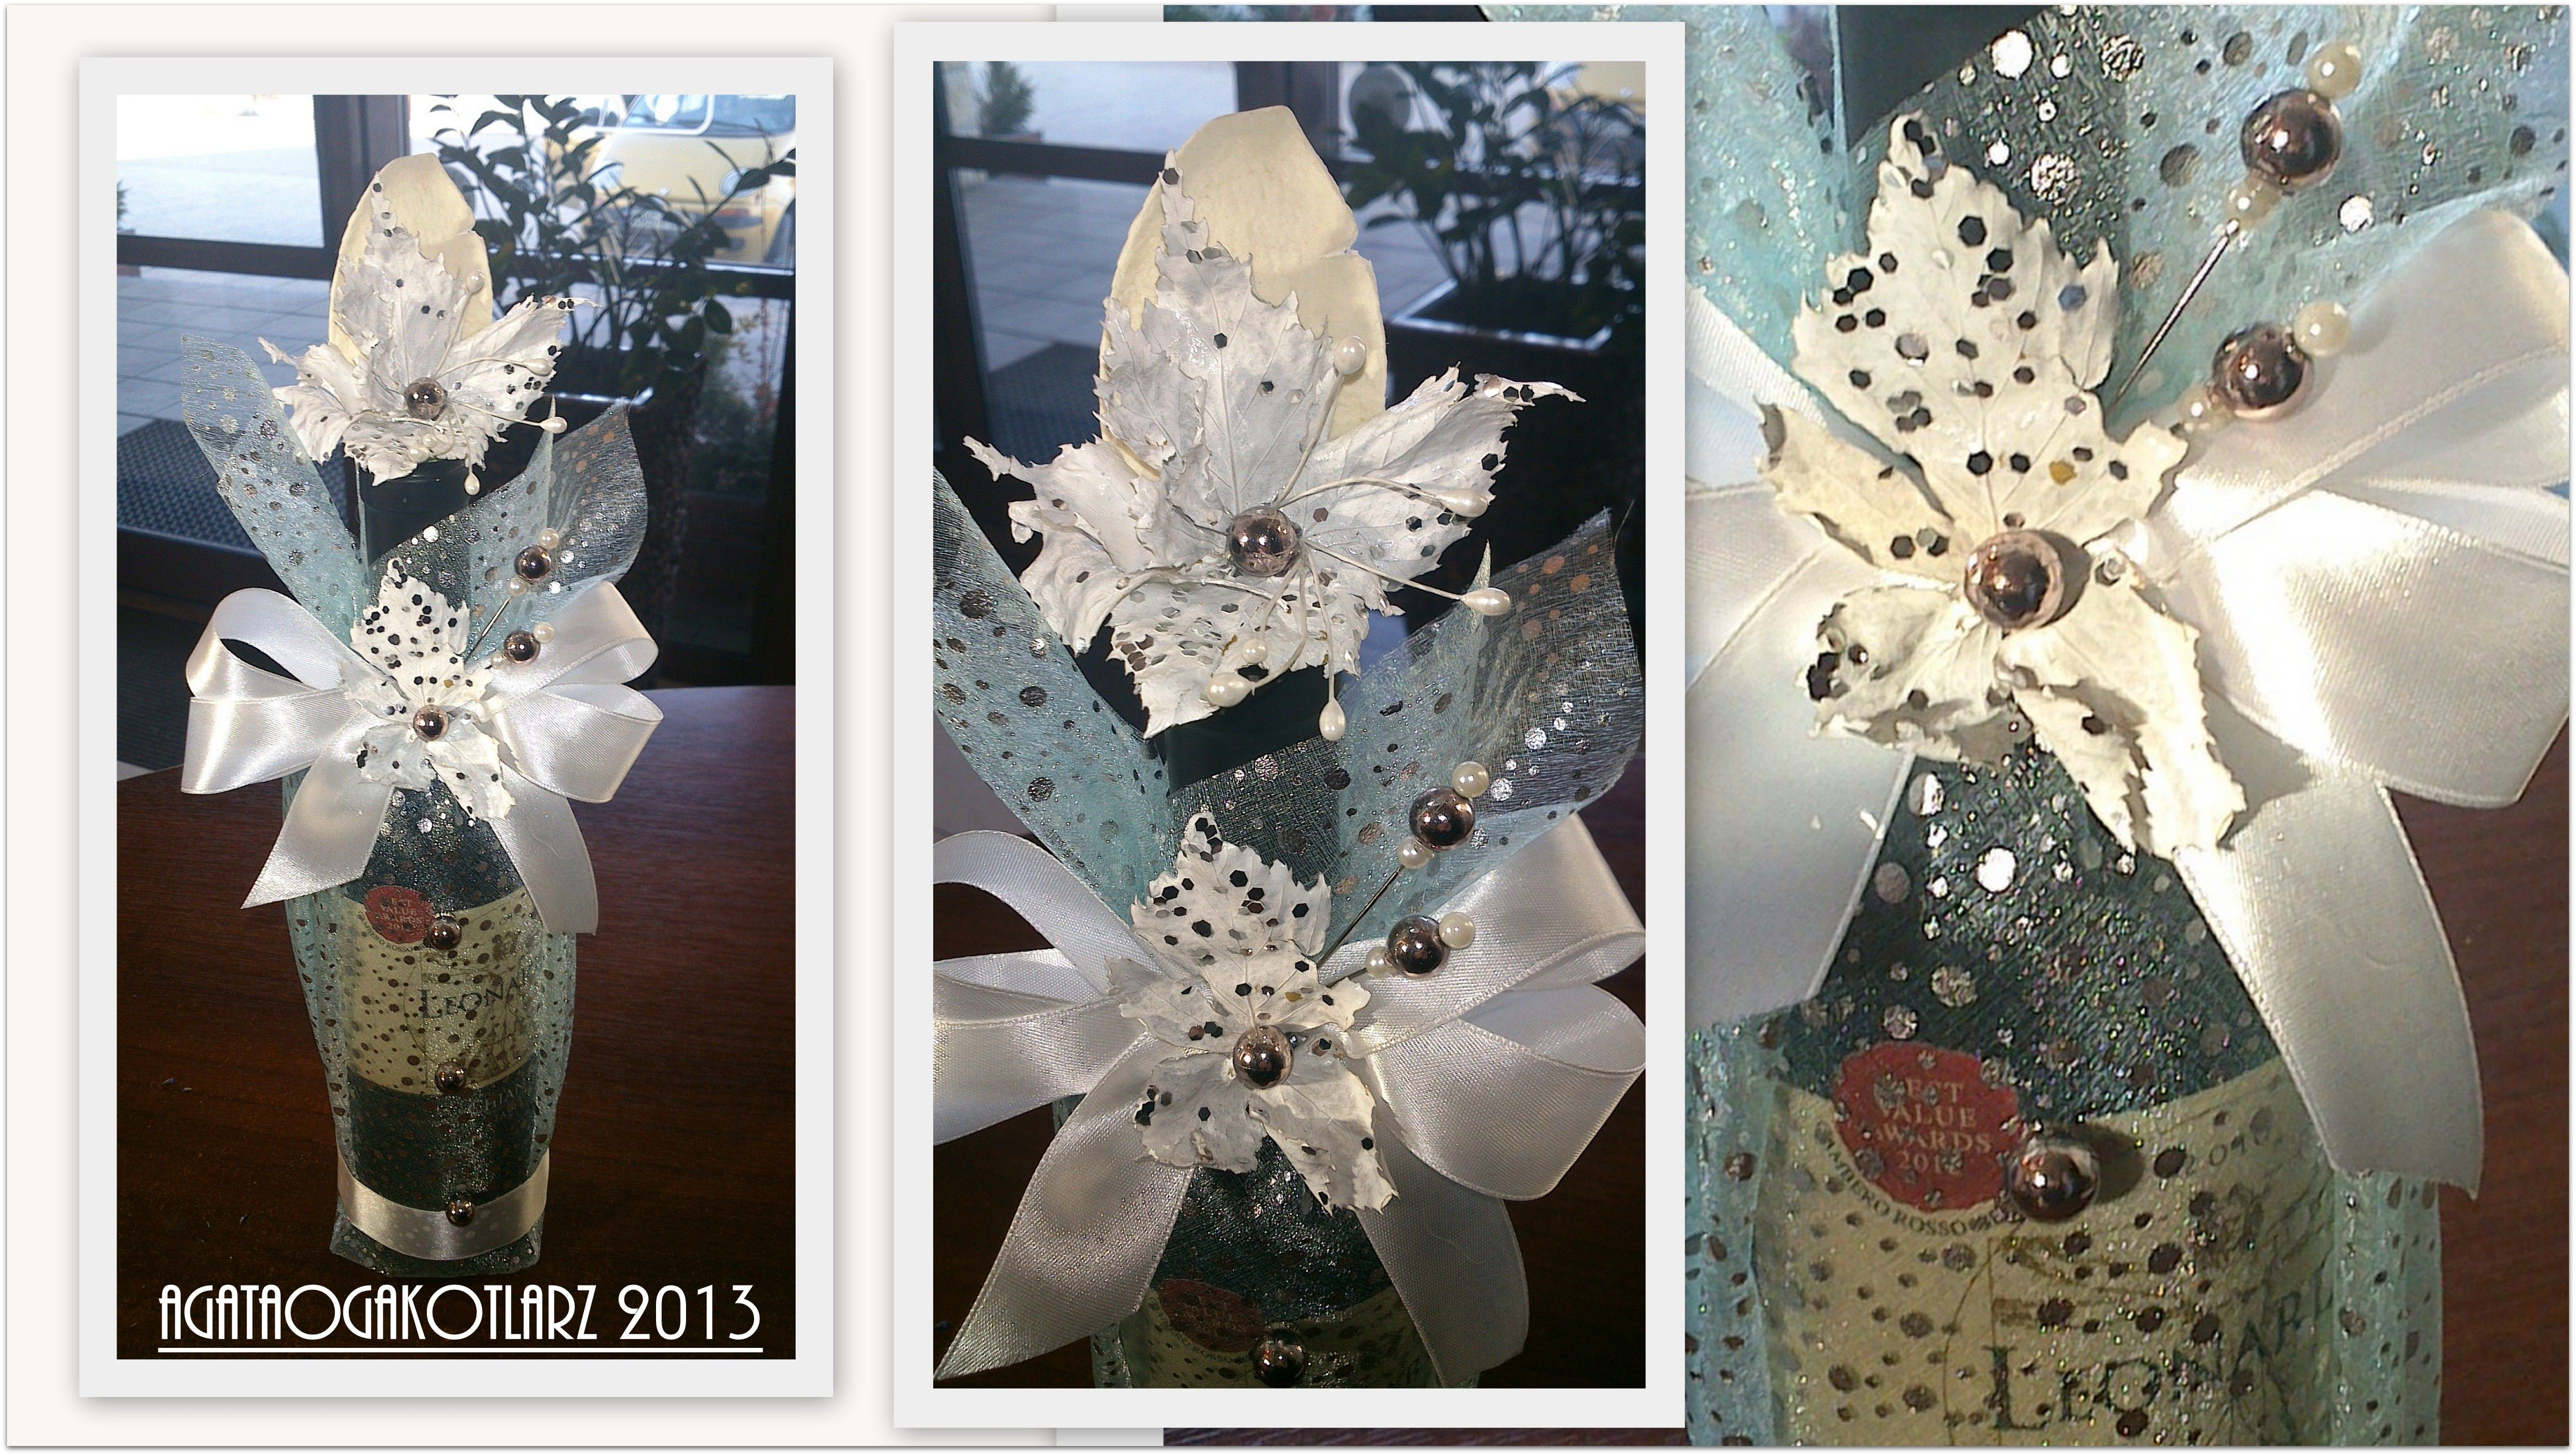 Butelka Wina Zapakowana W Material Ozdobiona Farbowanymi Na Bialo Liscmi Debu Glass Vase Vase Glass